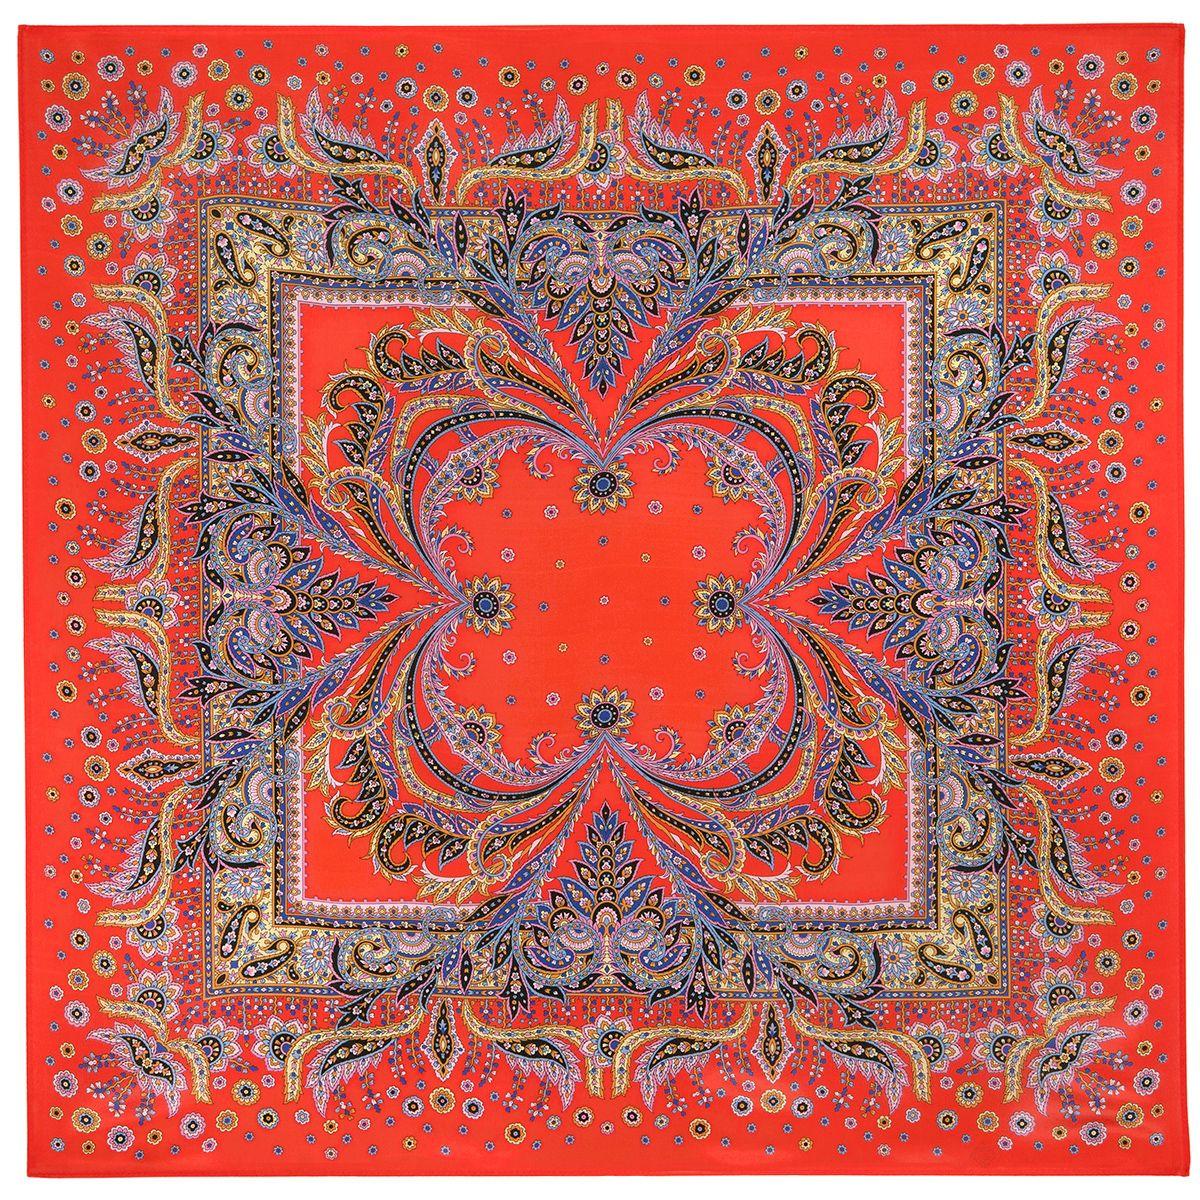 Платок «Коралловый бриз» 1603-4